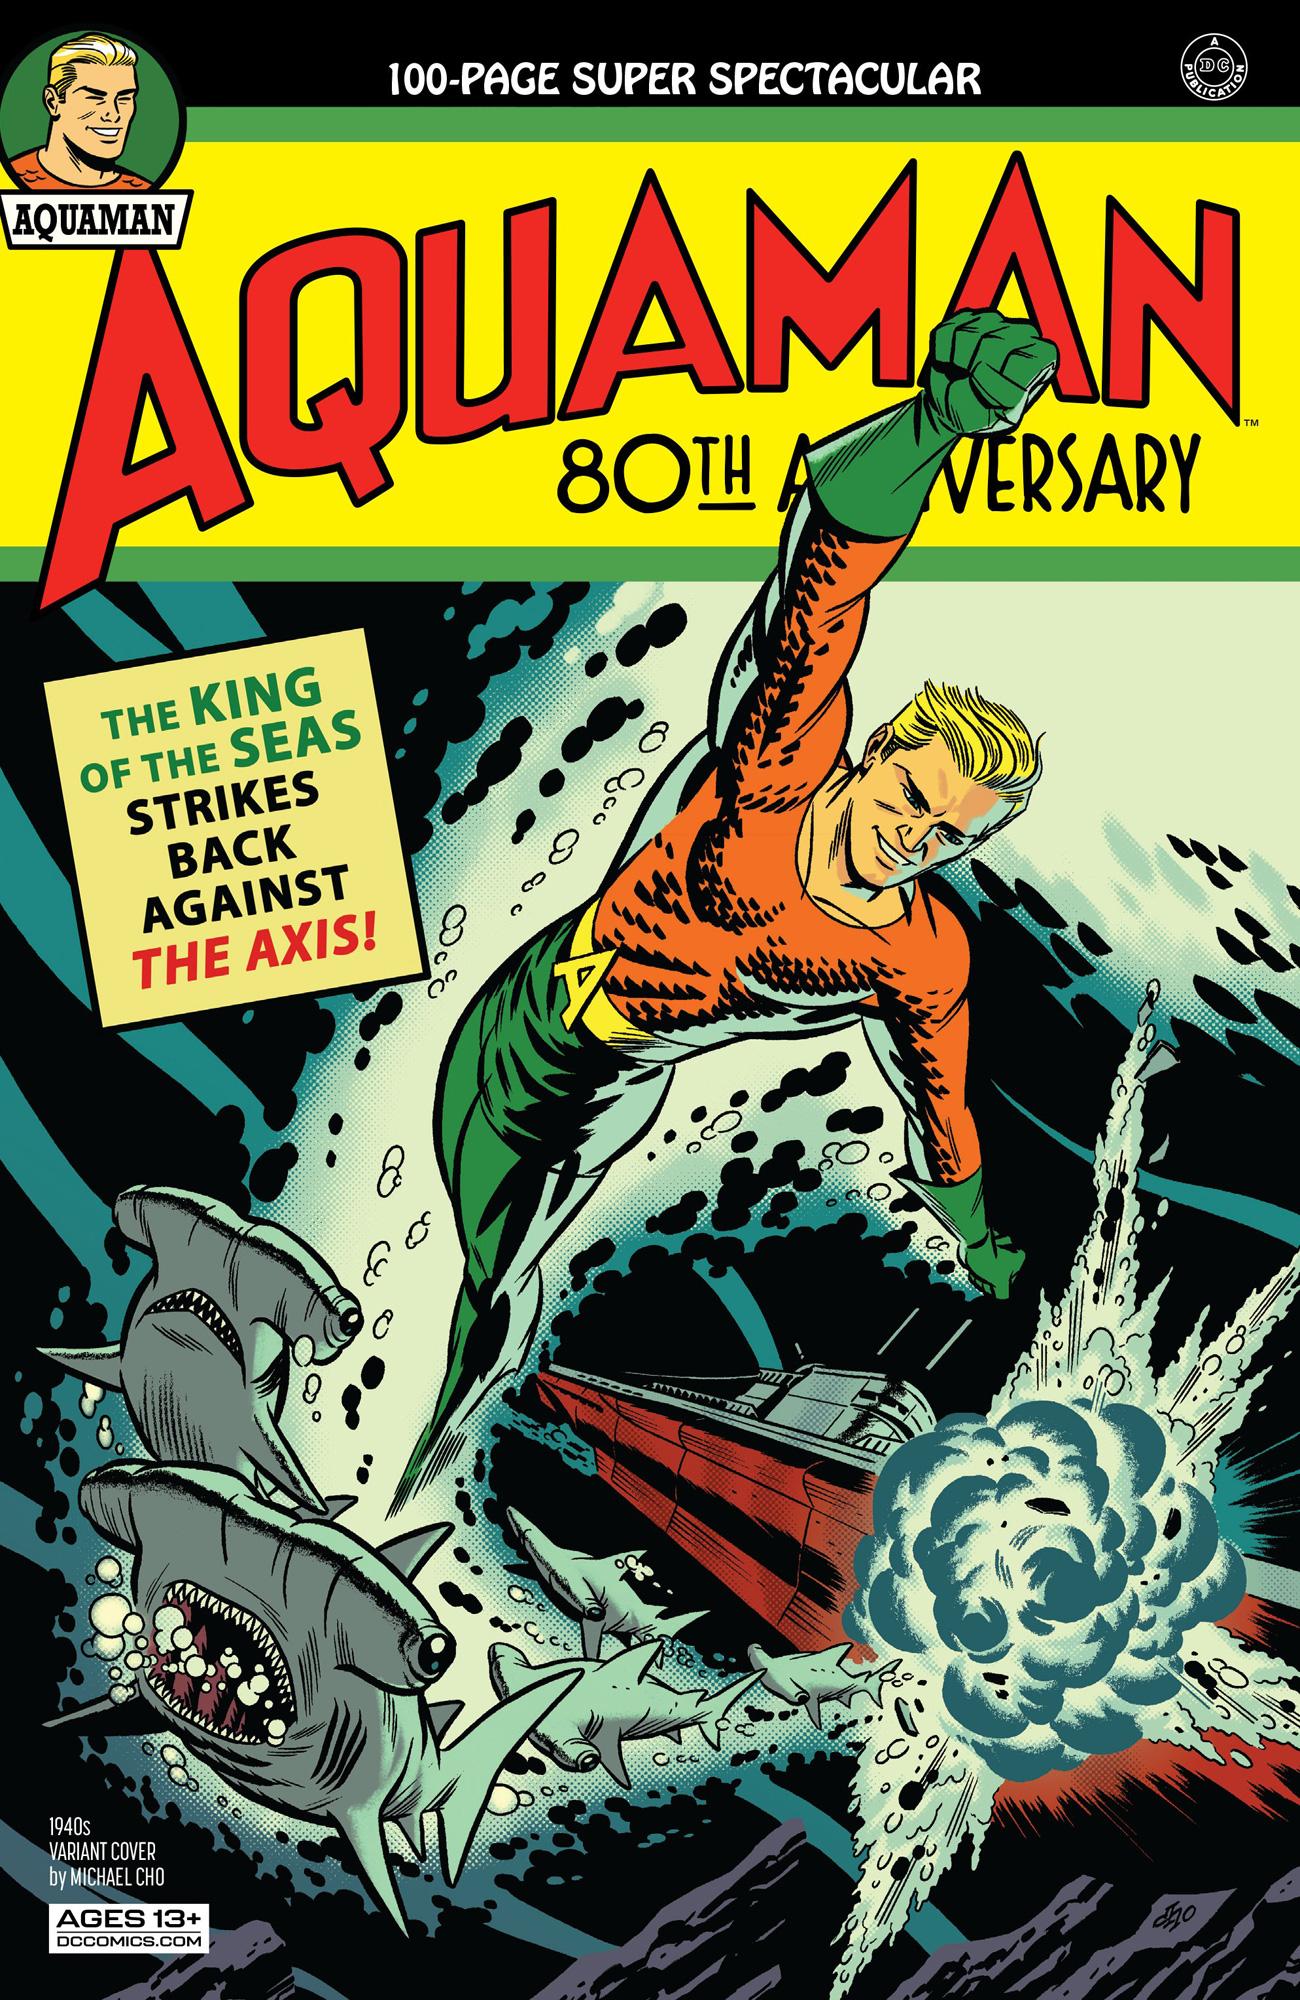 Variant Edition 1940